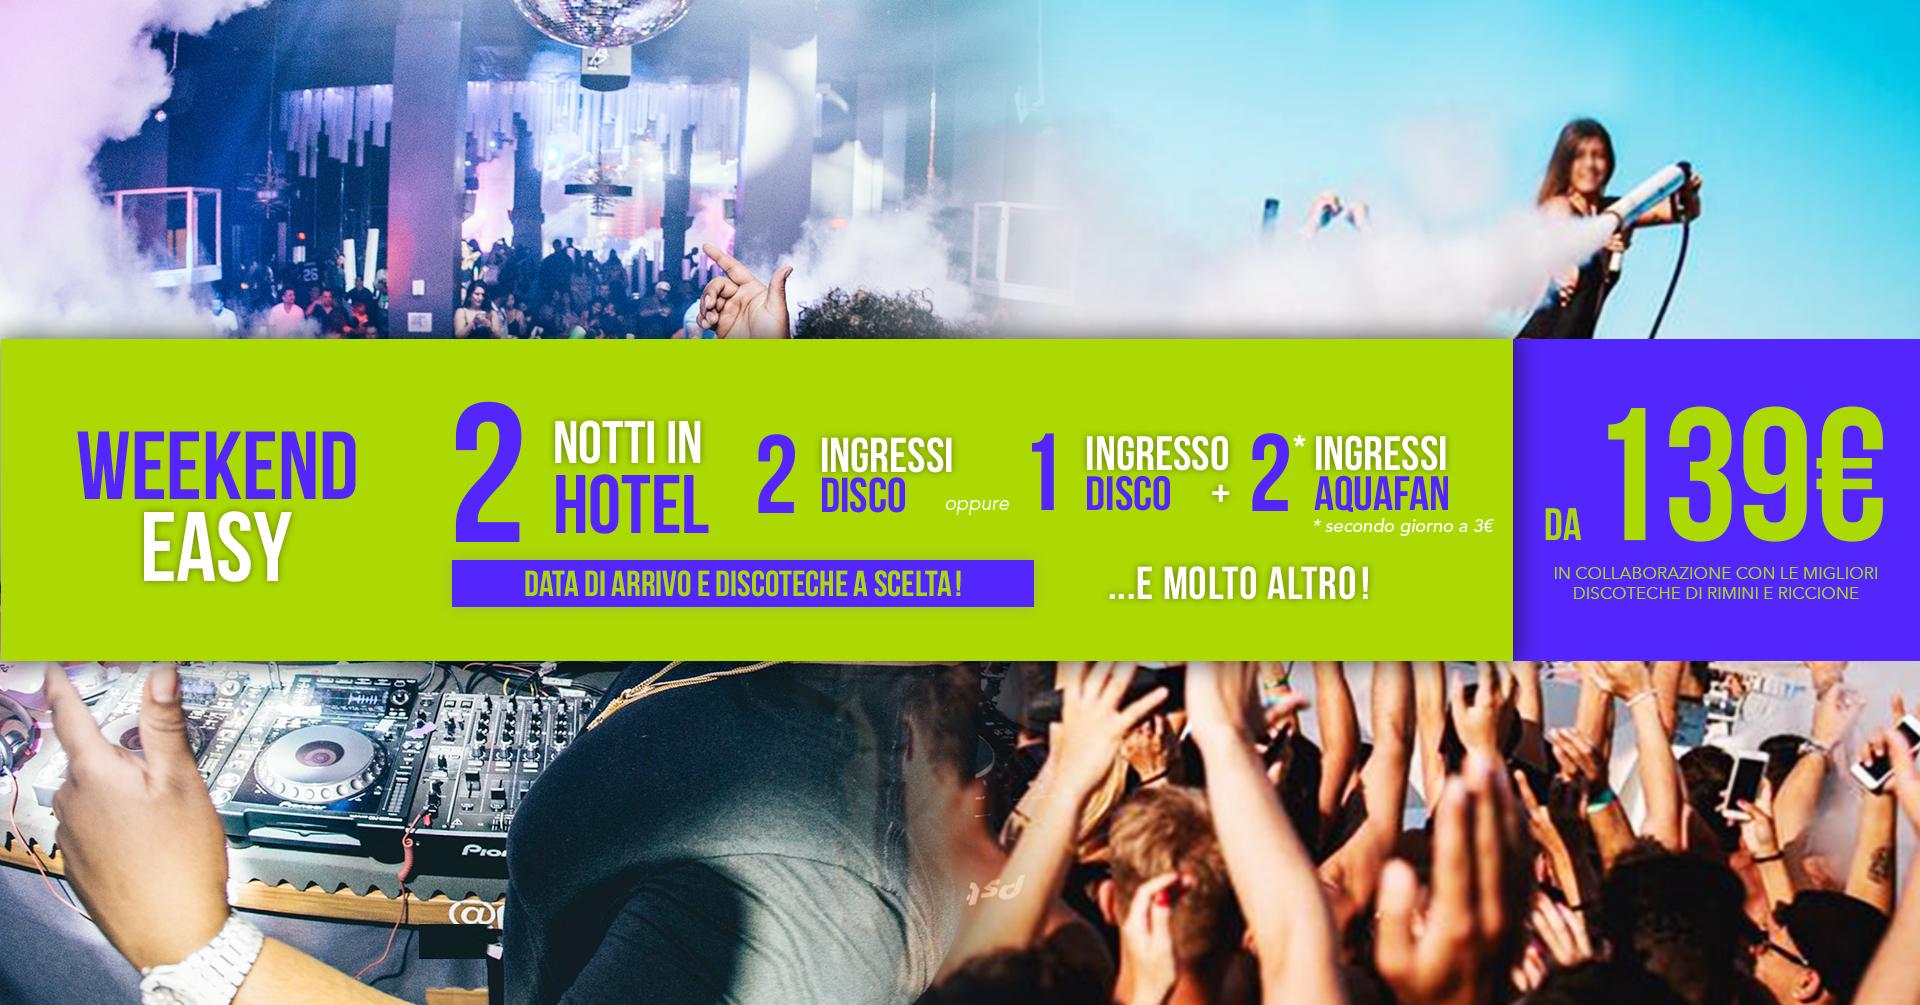 Pacchetto Week End Riccione Hotel + Discoteche Easy